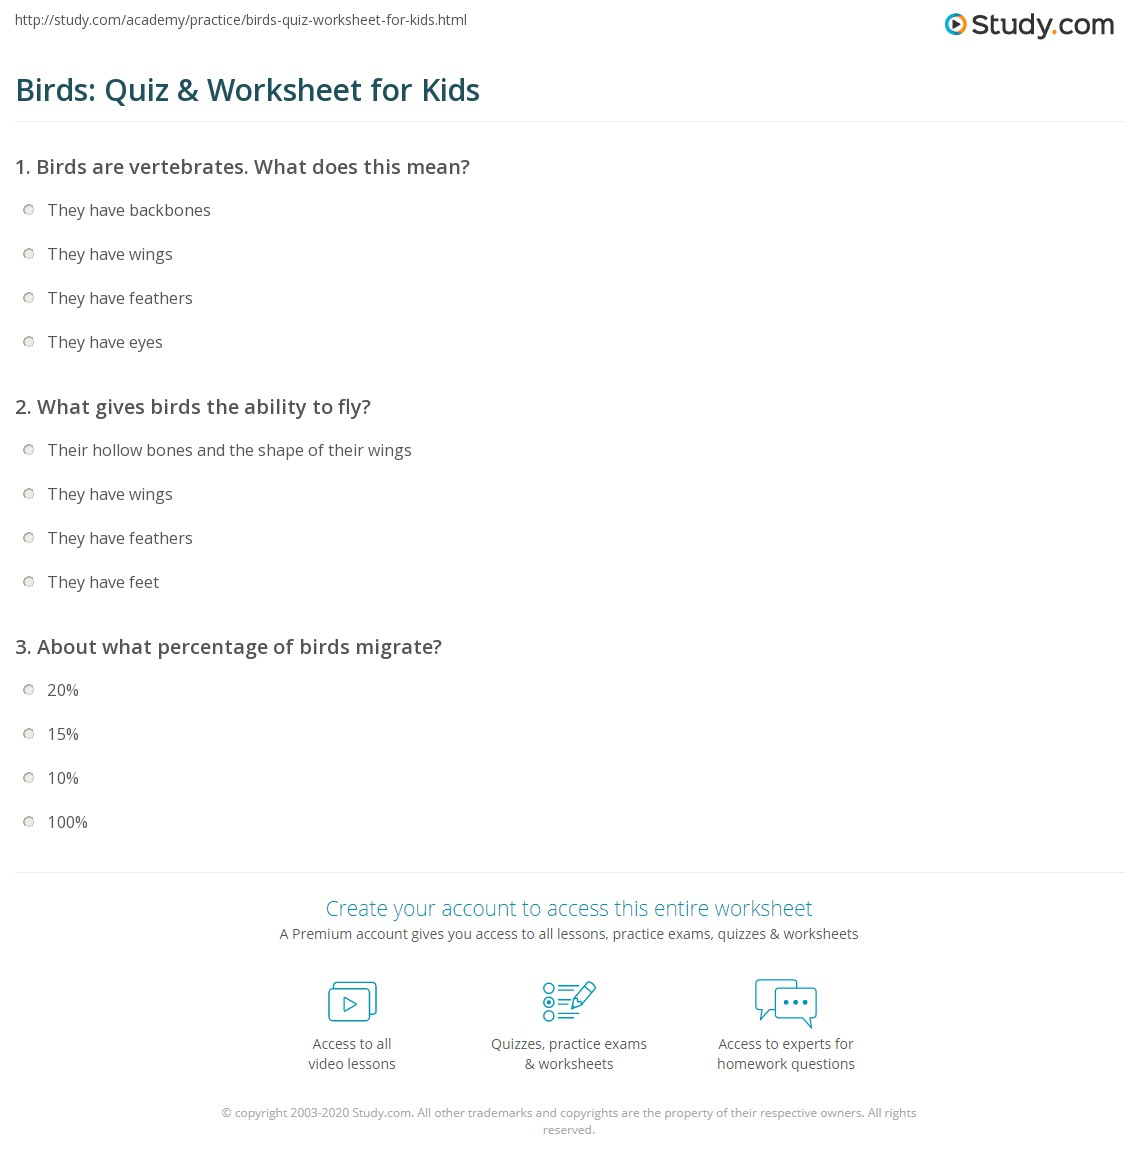 Birds: Quiz & Worksheet for Kids | Study.com